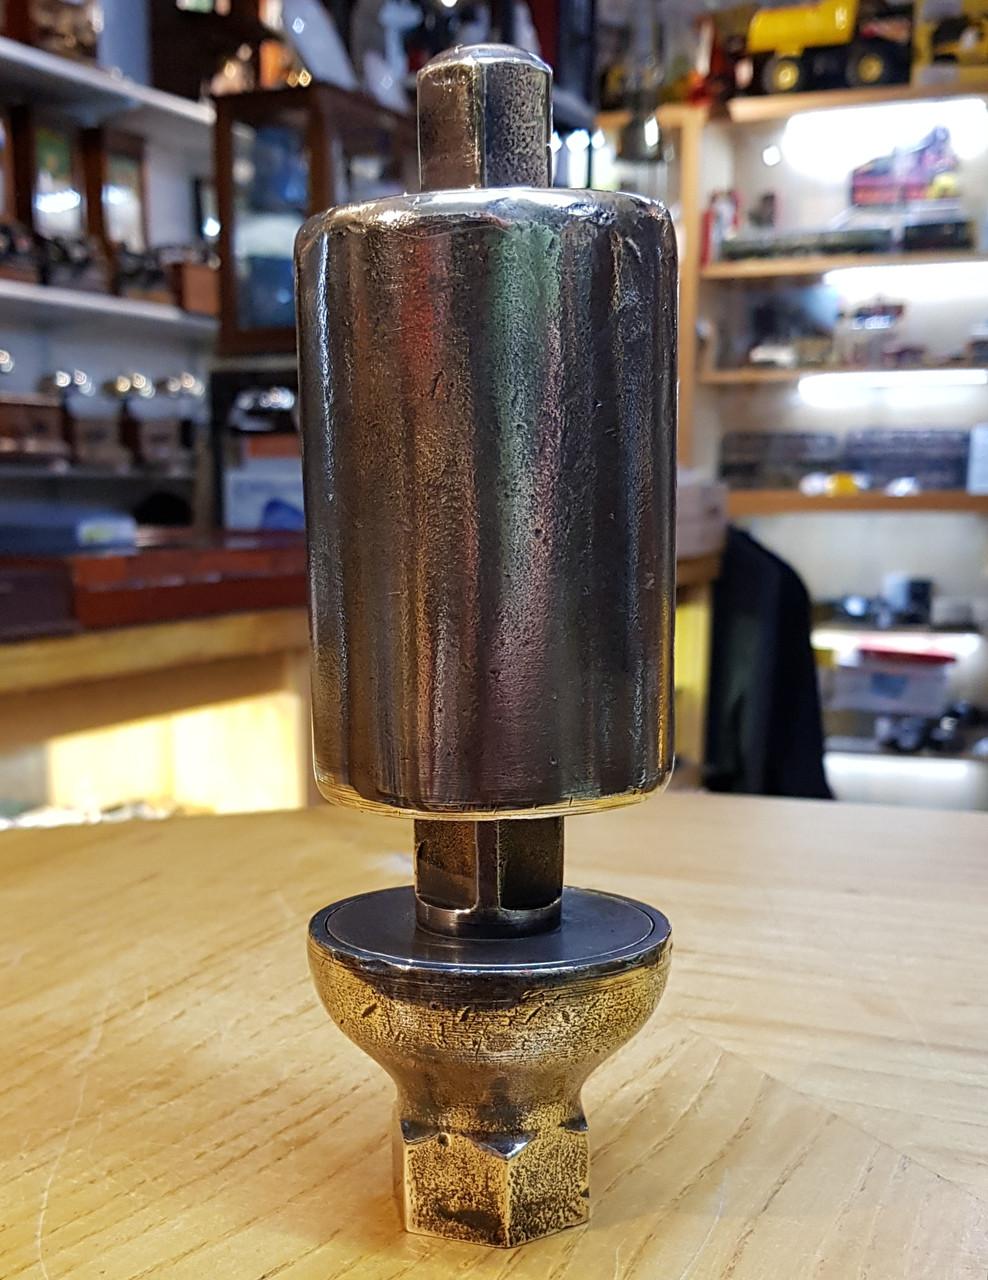 VT 2804.  G.W.R.  BRONZE LOCOMOTIVE WHISTLE